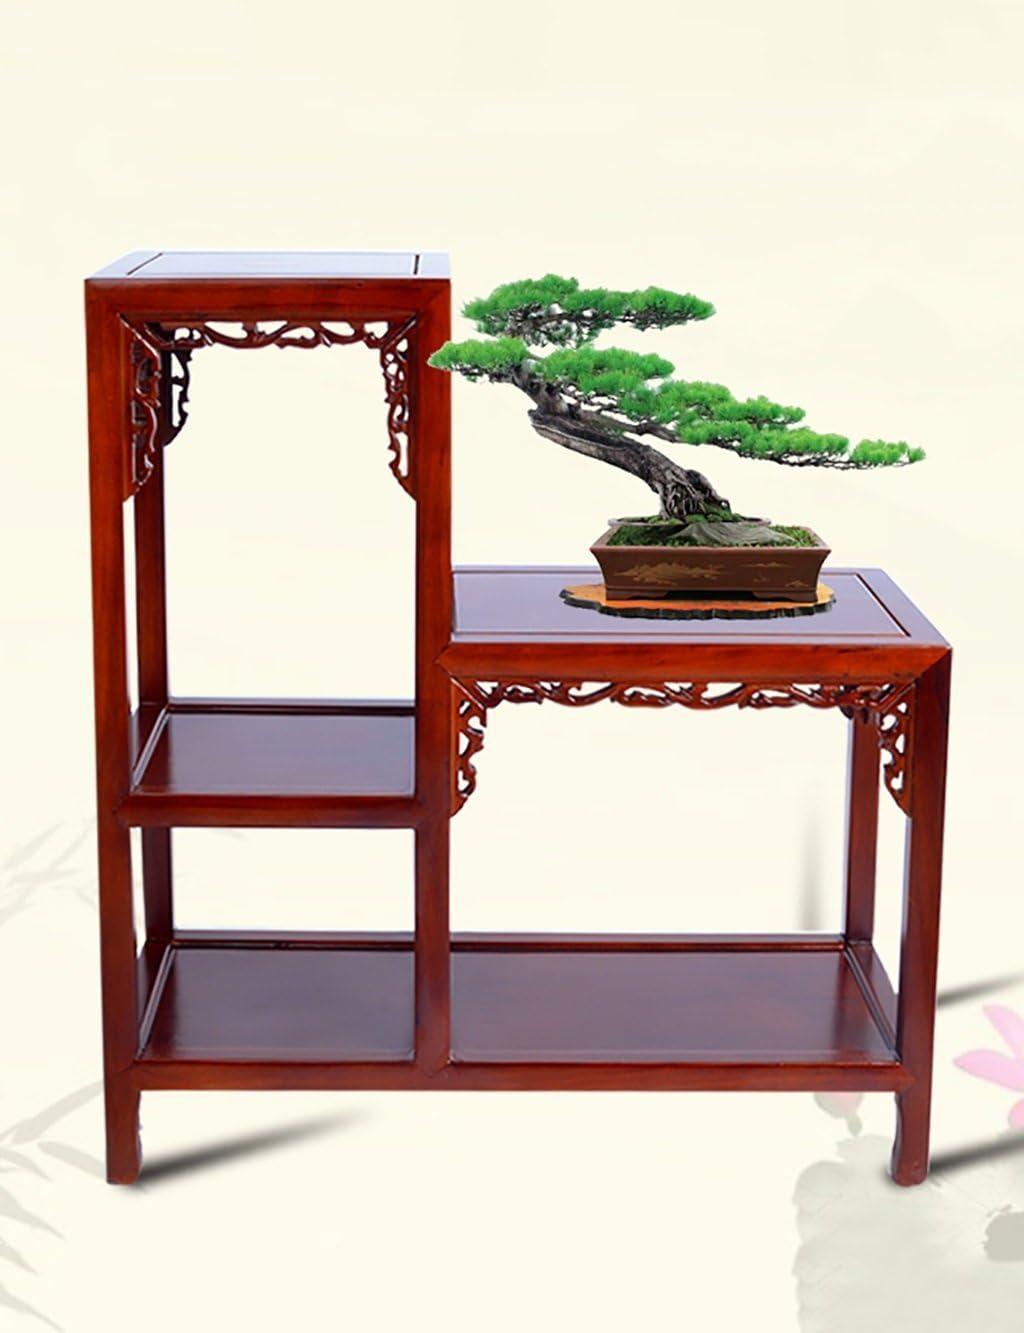 Stand de planta Flower Racks, mesa de café alta y baja Bonsai de ...